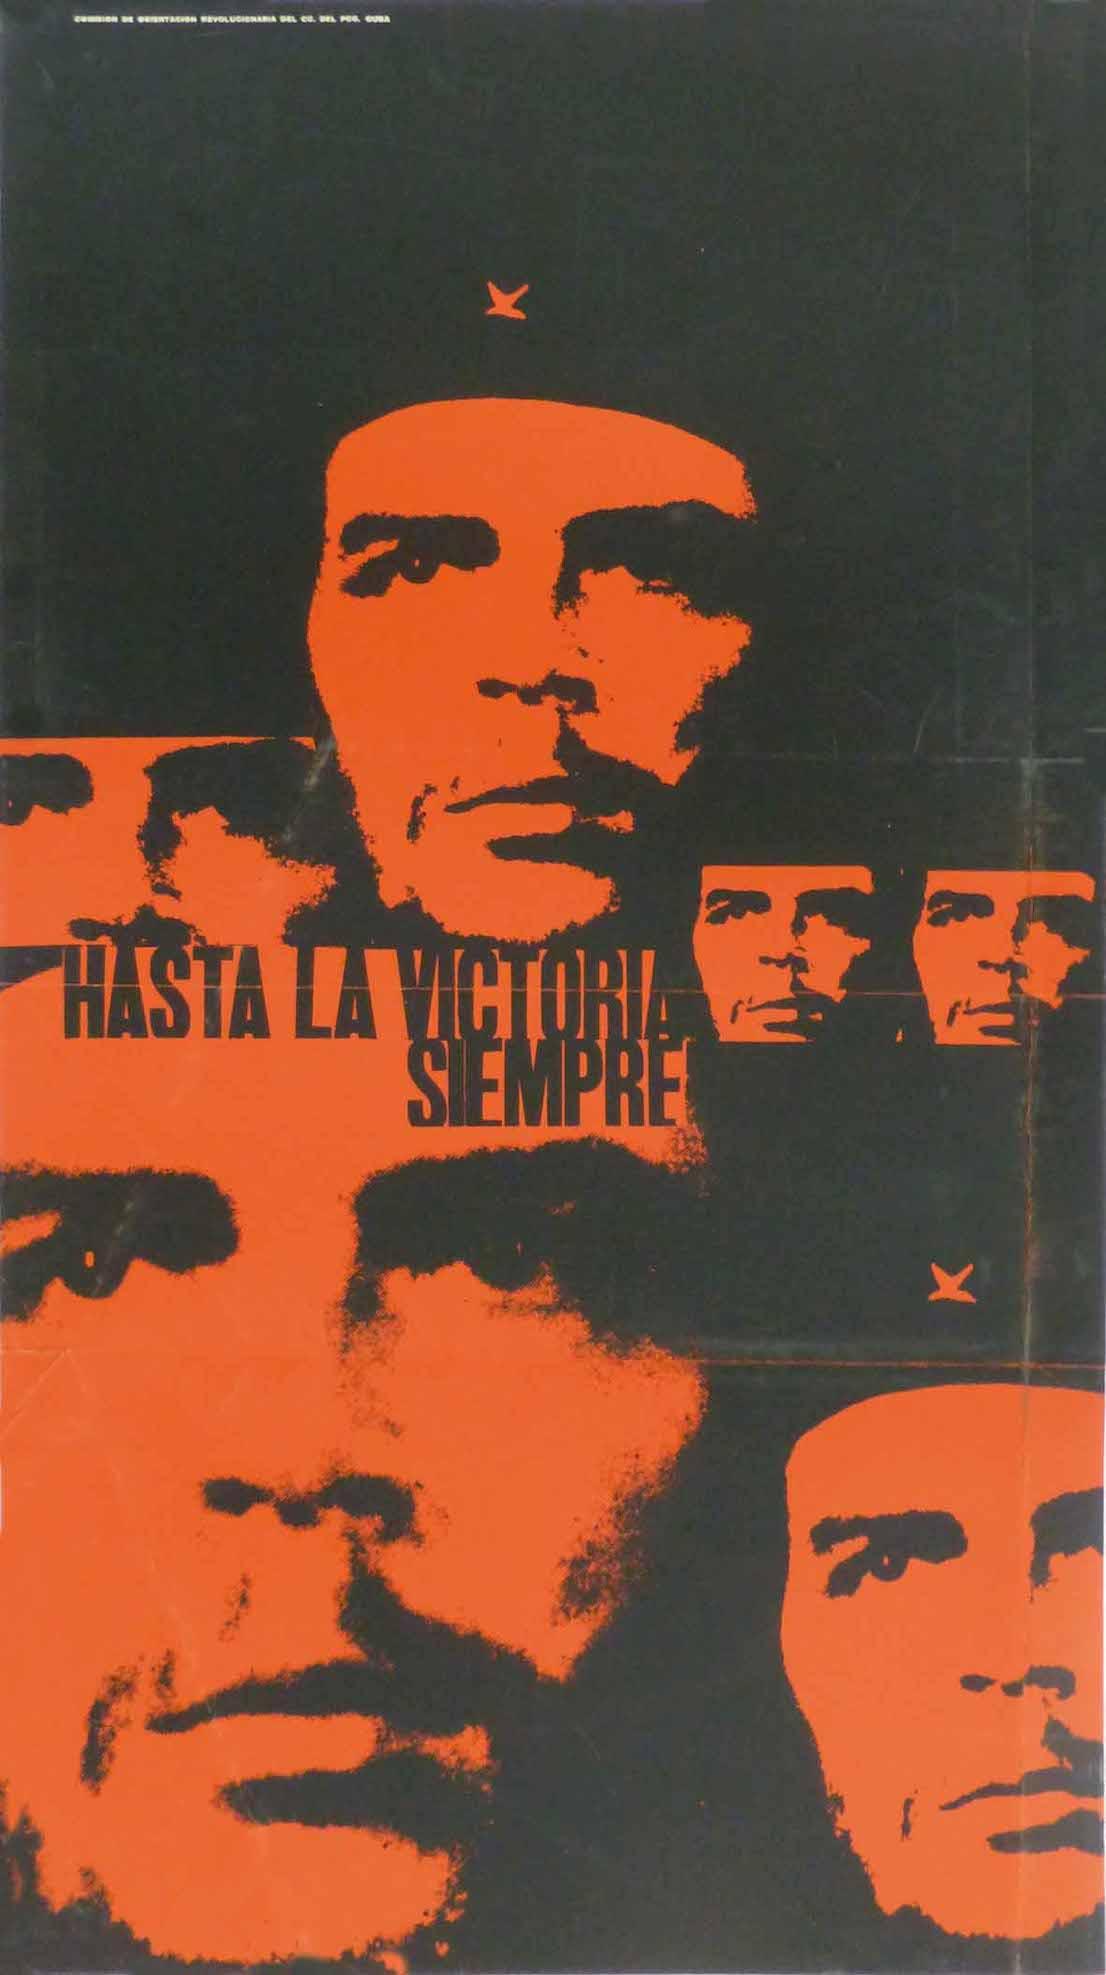 Antonio Pérez González Ñiko, Hasta la Victoria Siempre, 1968.